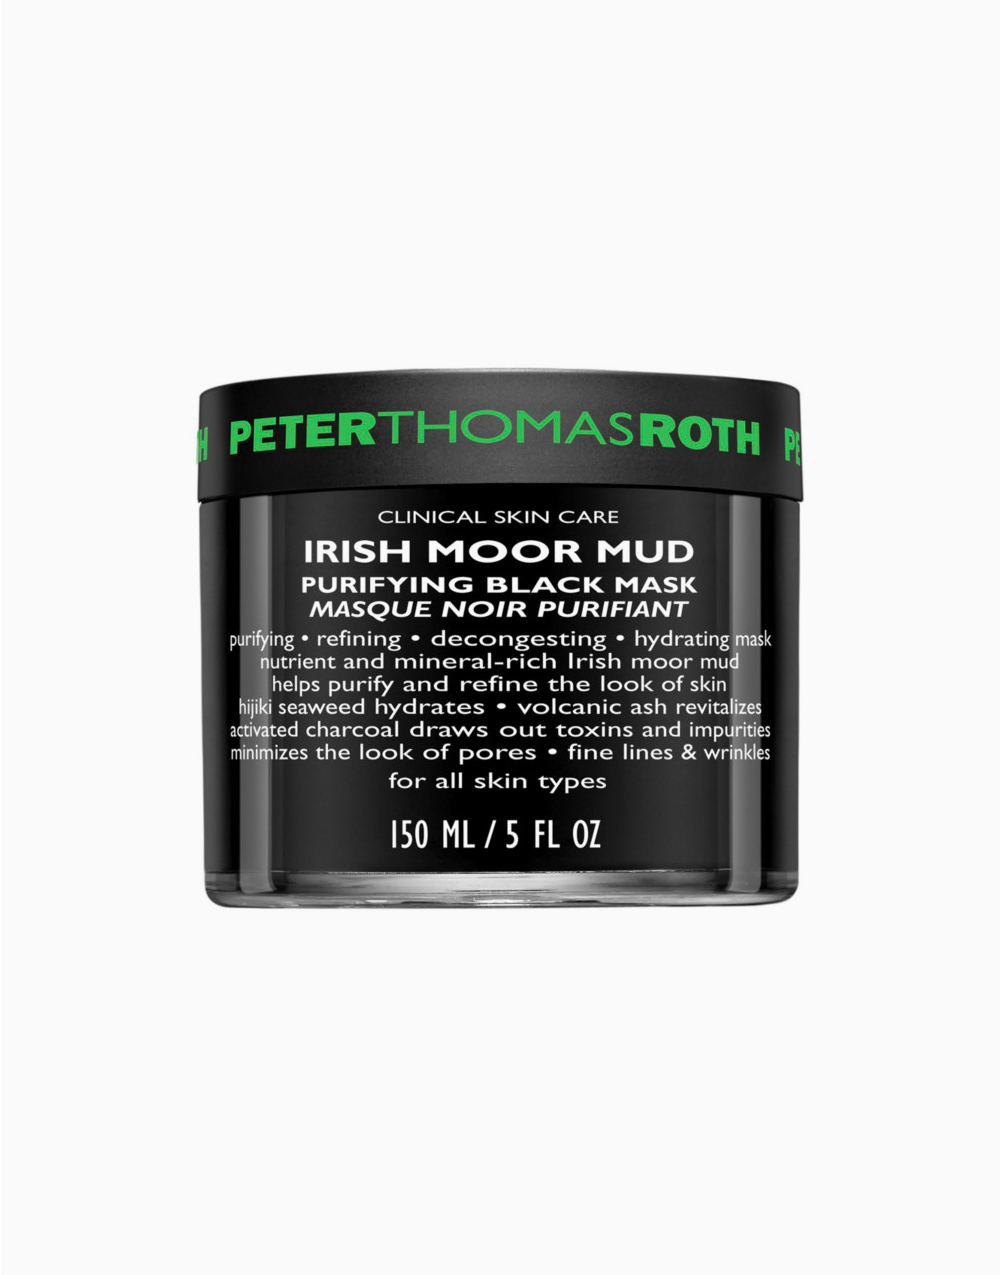 Irish Moor Mud Mask by Peter Thomas Roth